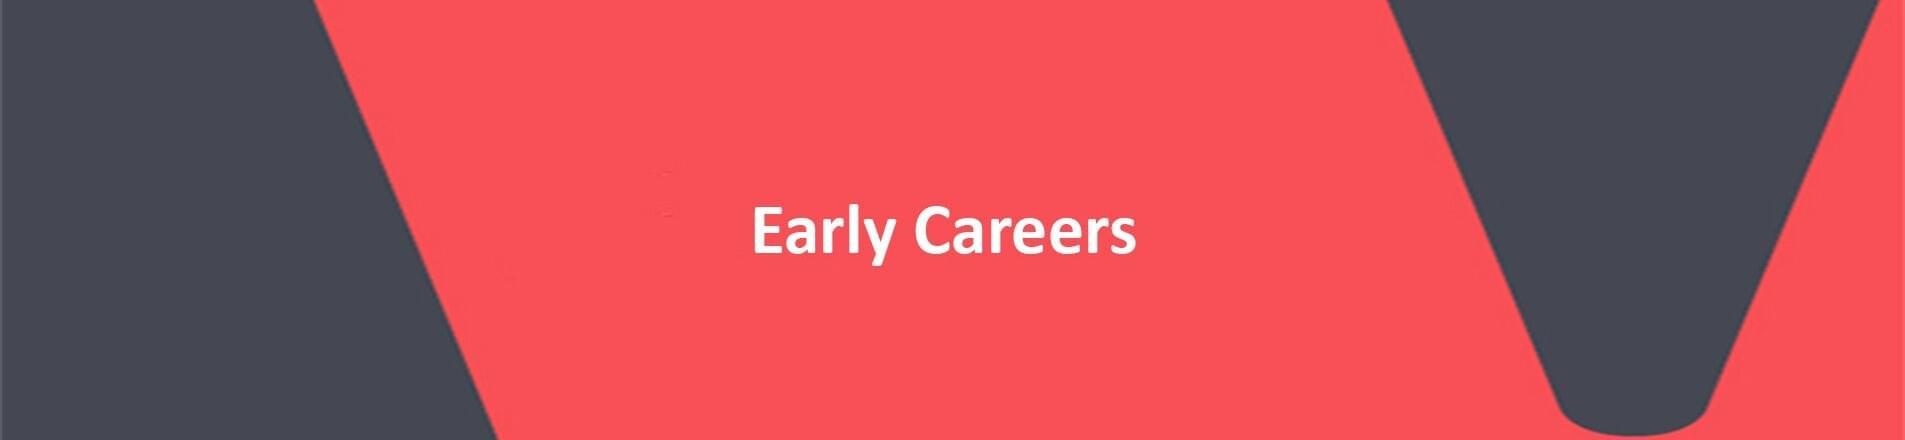 Early Careers.